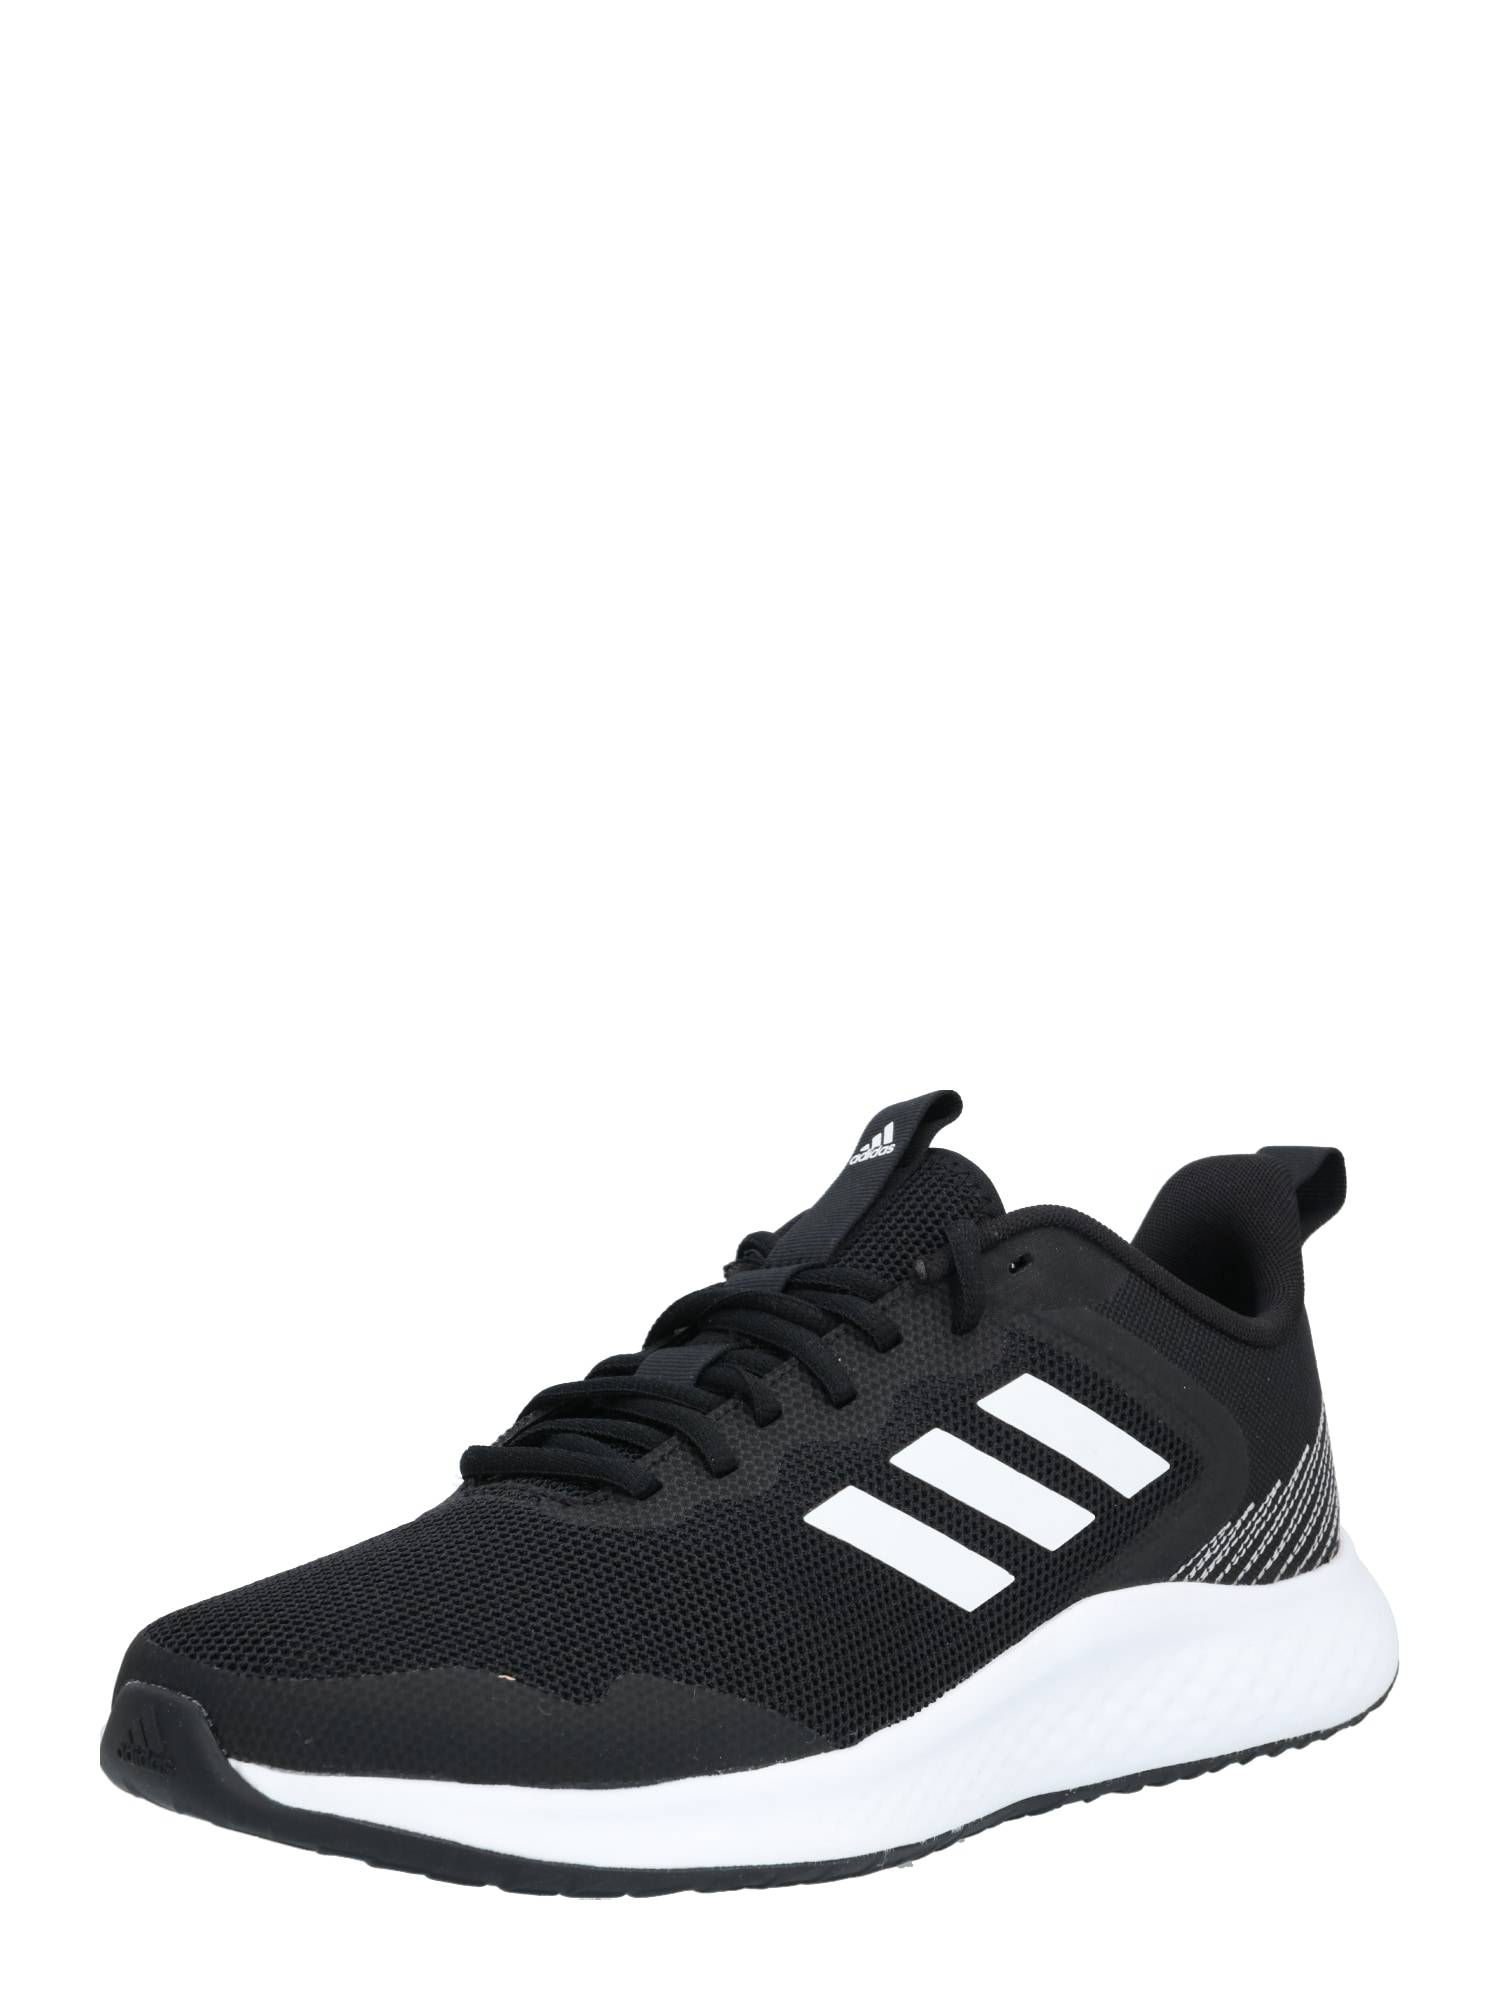 ADIDAS PERFORMANCE Chaussure de course 'Fluid Street'  - Noir - Taille: 9 - male